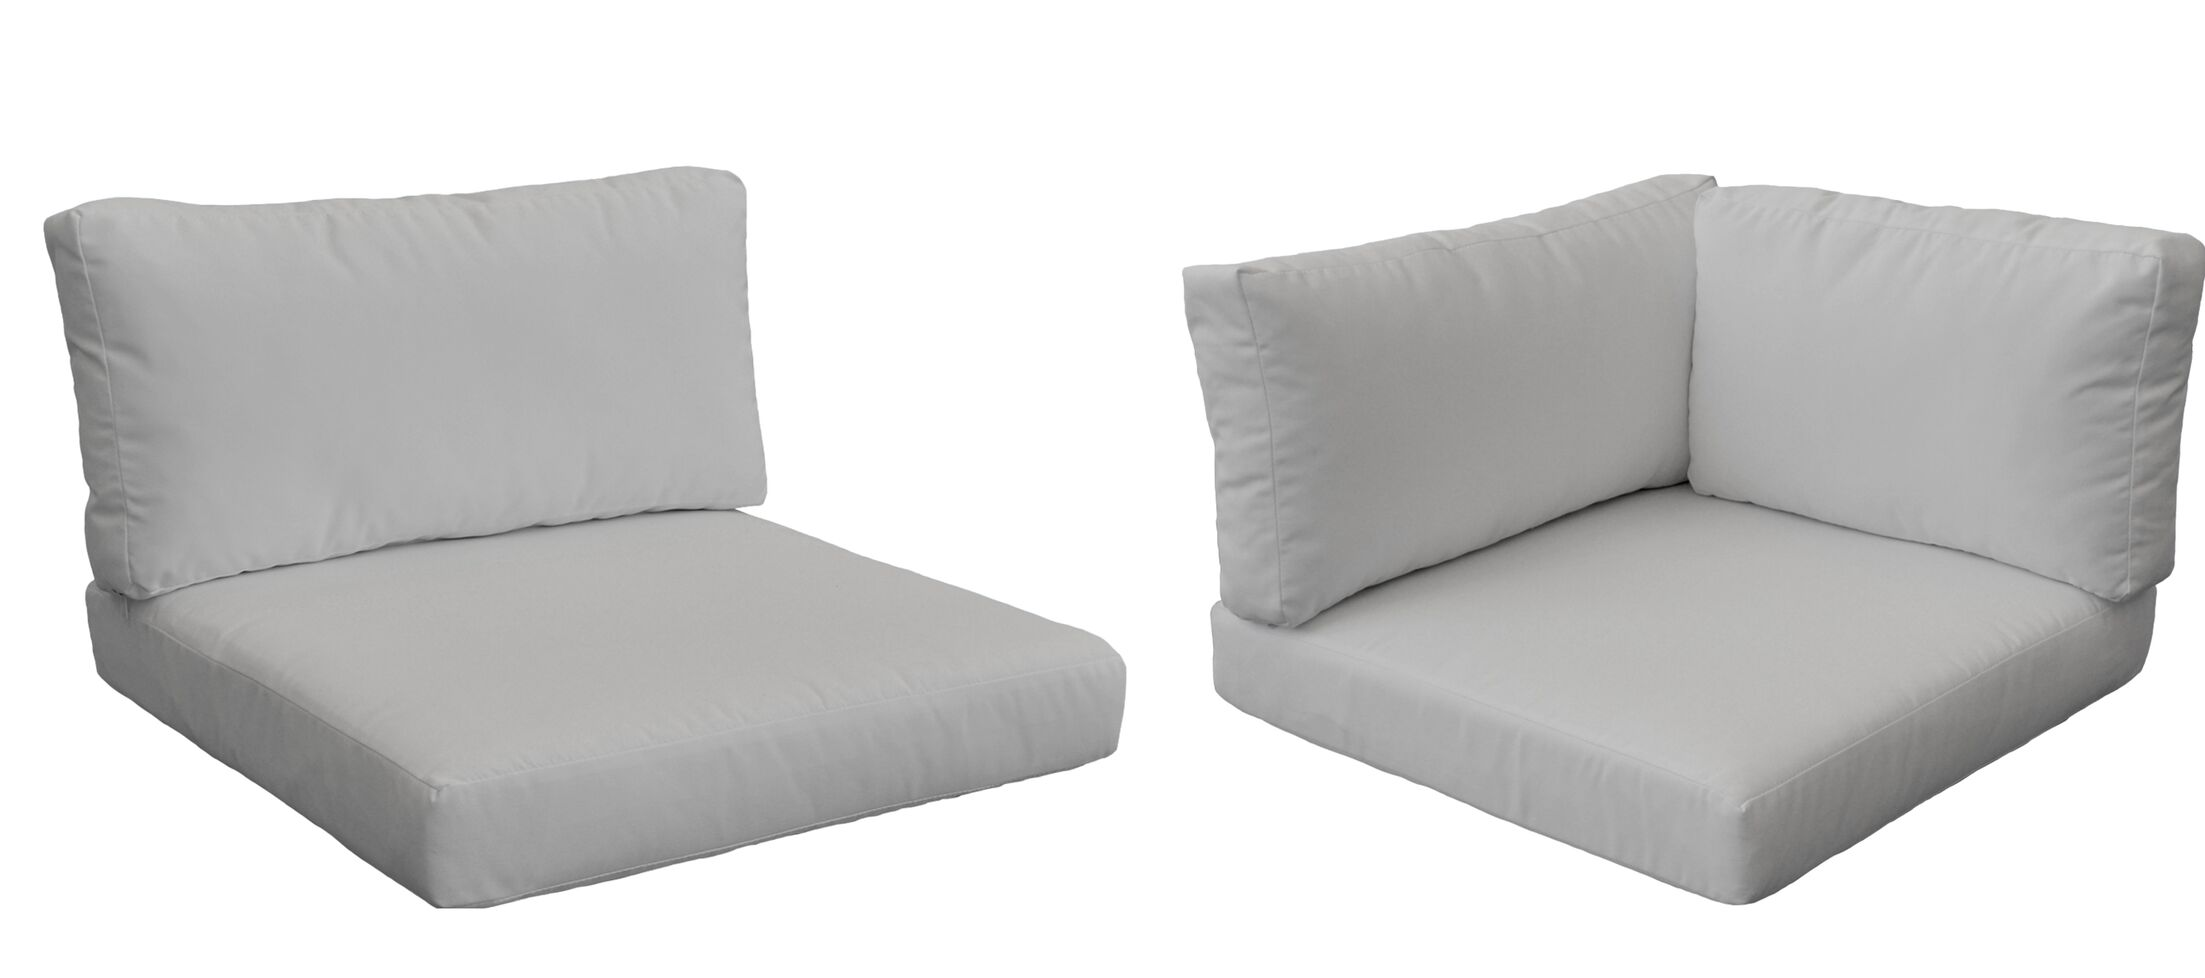 Monaco Outdoor 10 Piece Lounge Chair Cushion Set Fabric: Gray